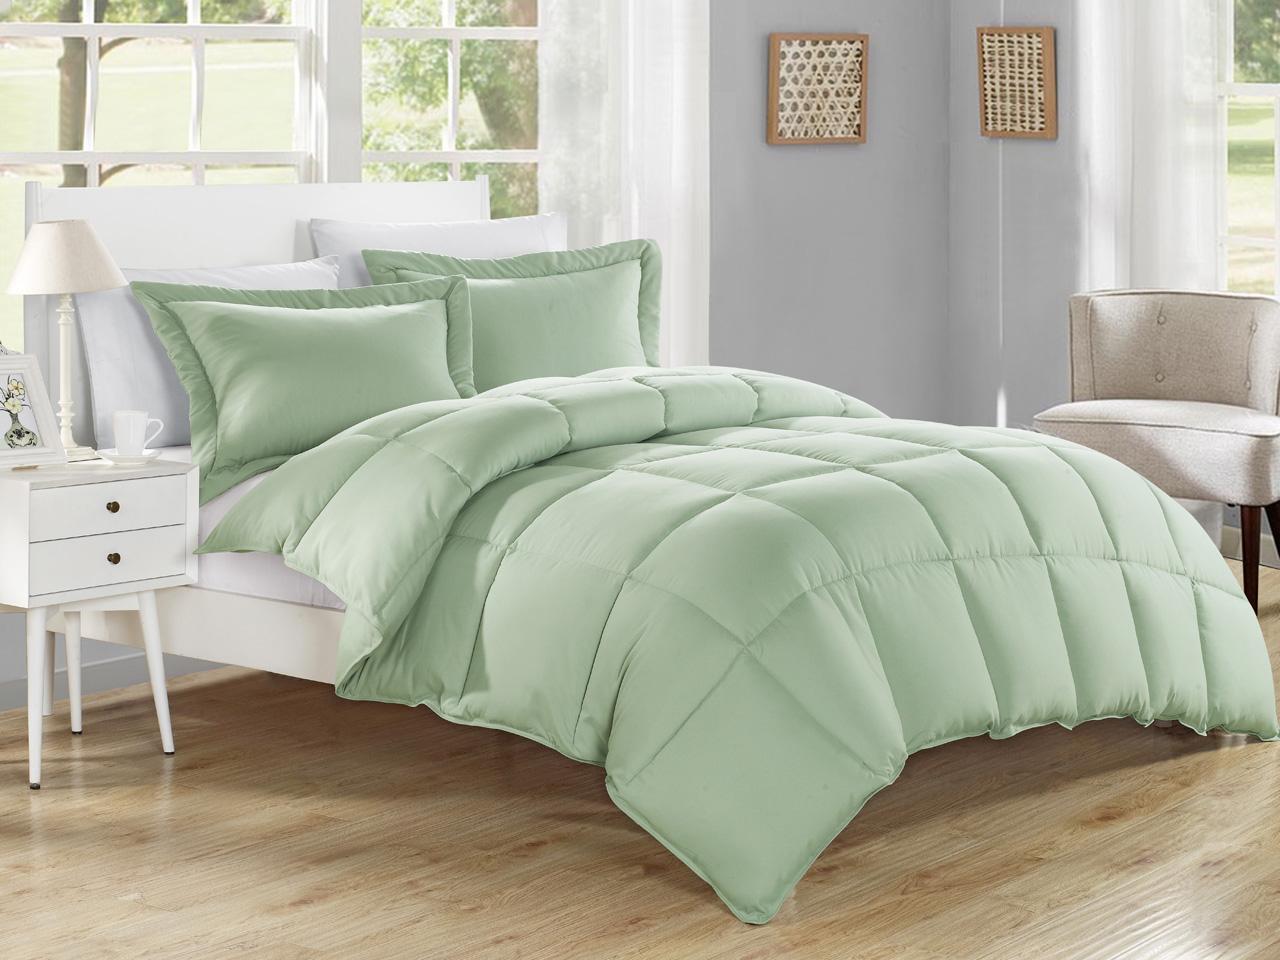 KingLinen® Down Alternative Comforter Set